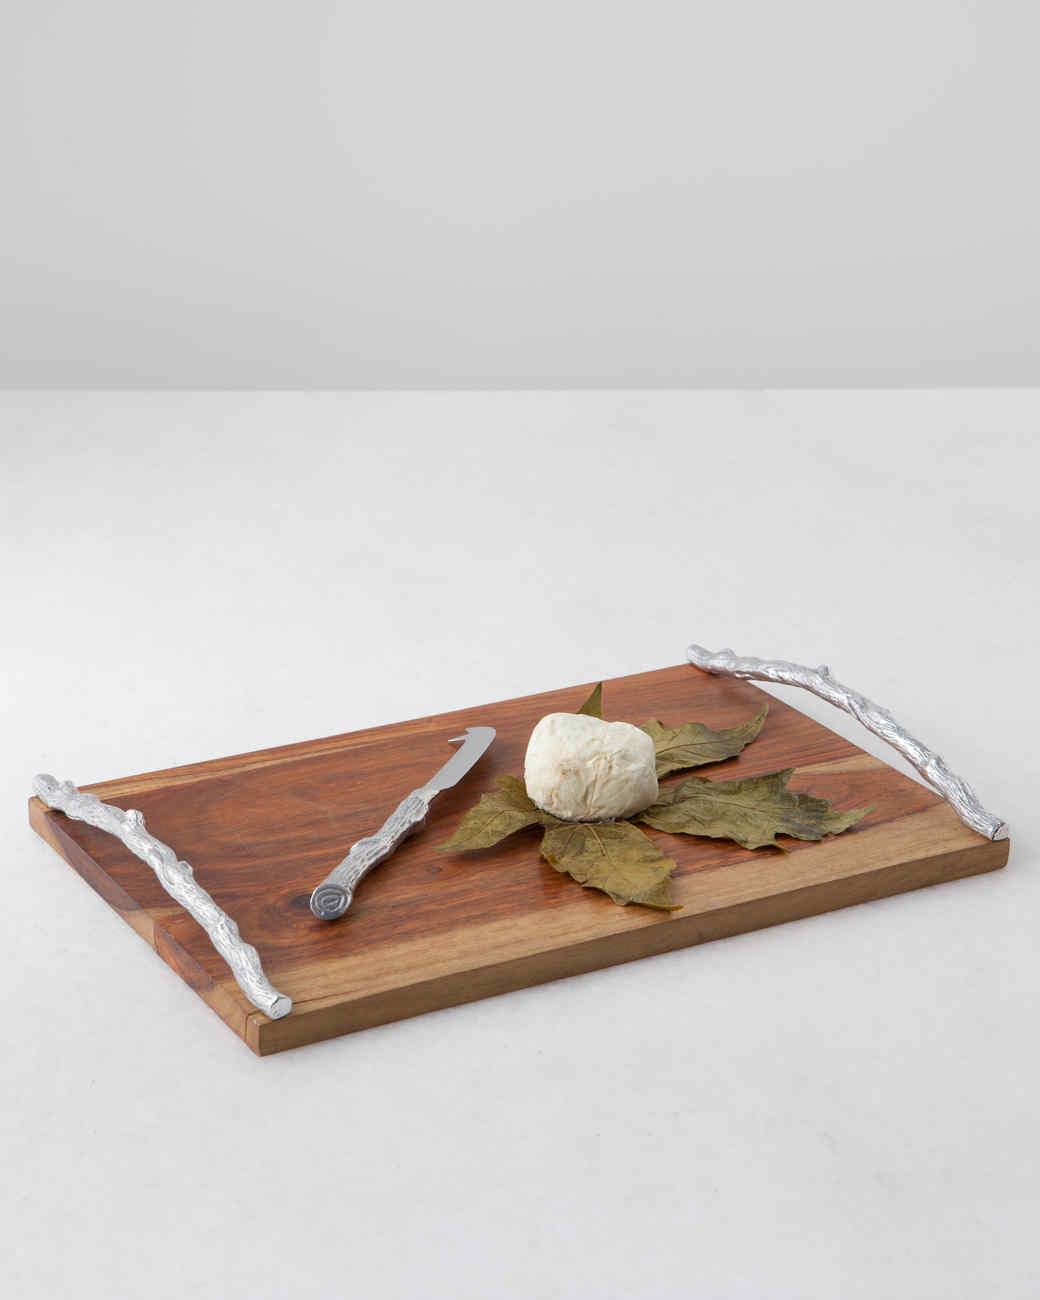 cheese-boards-d110478-0065r.jpg